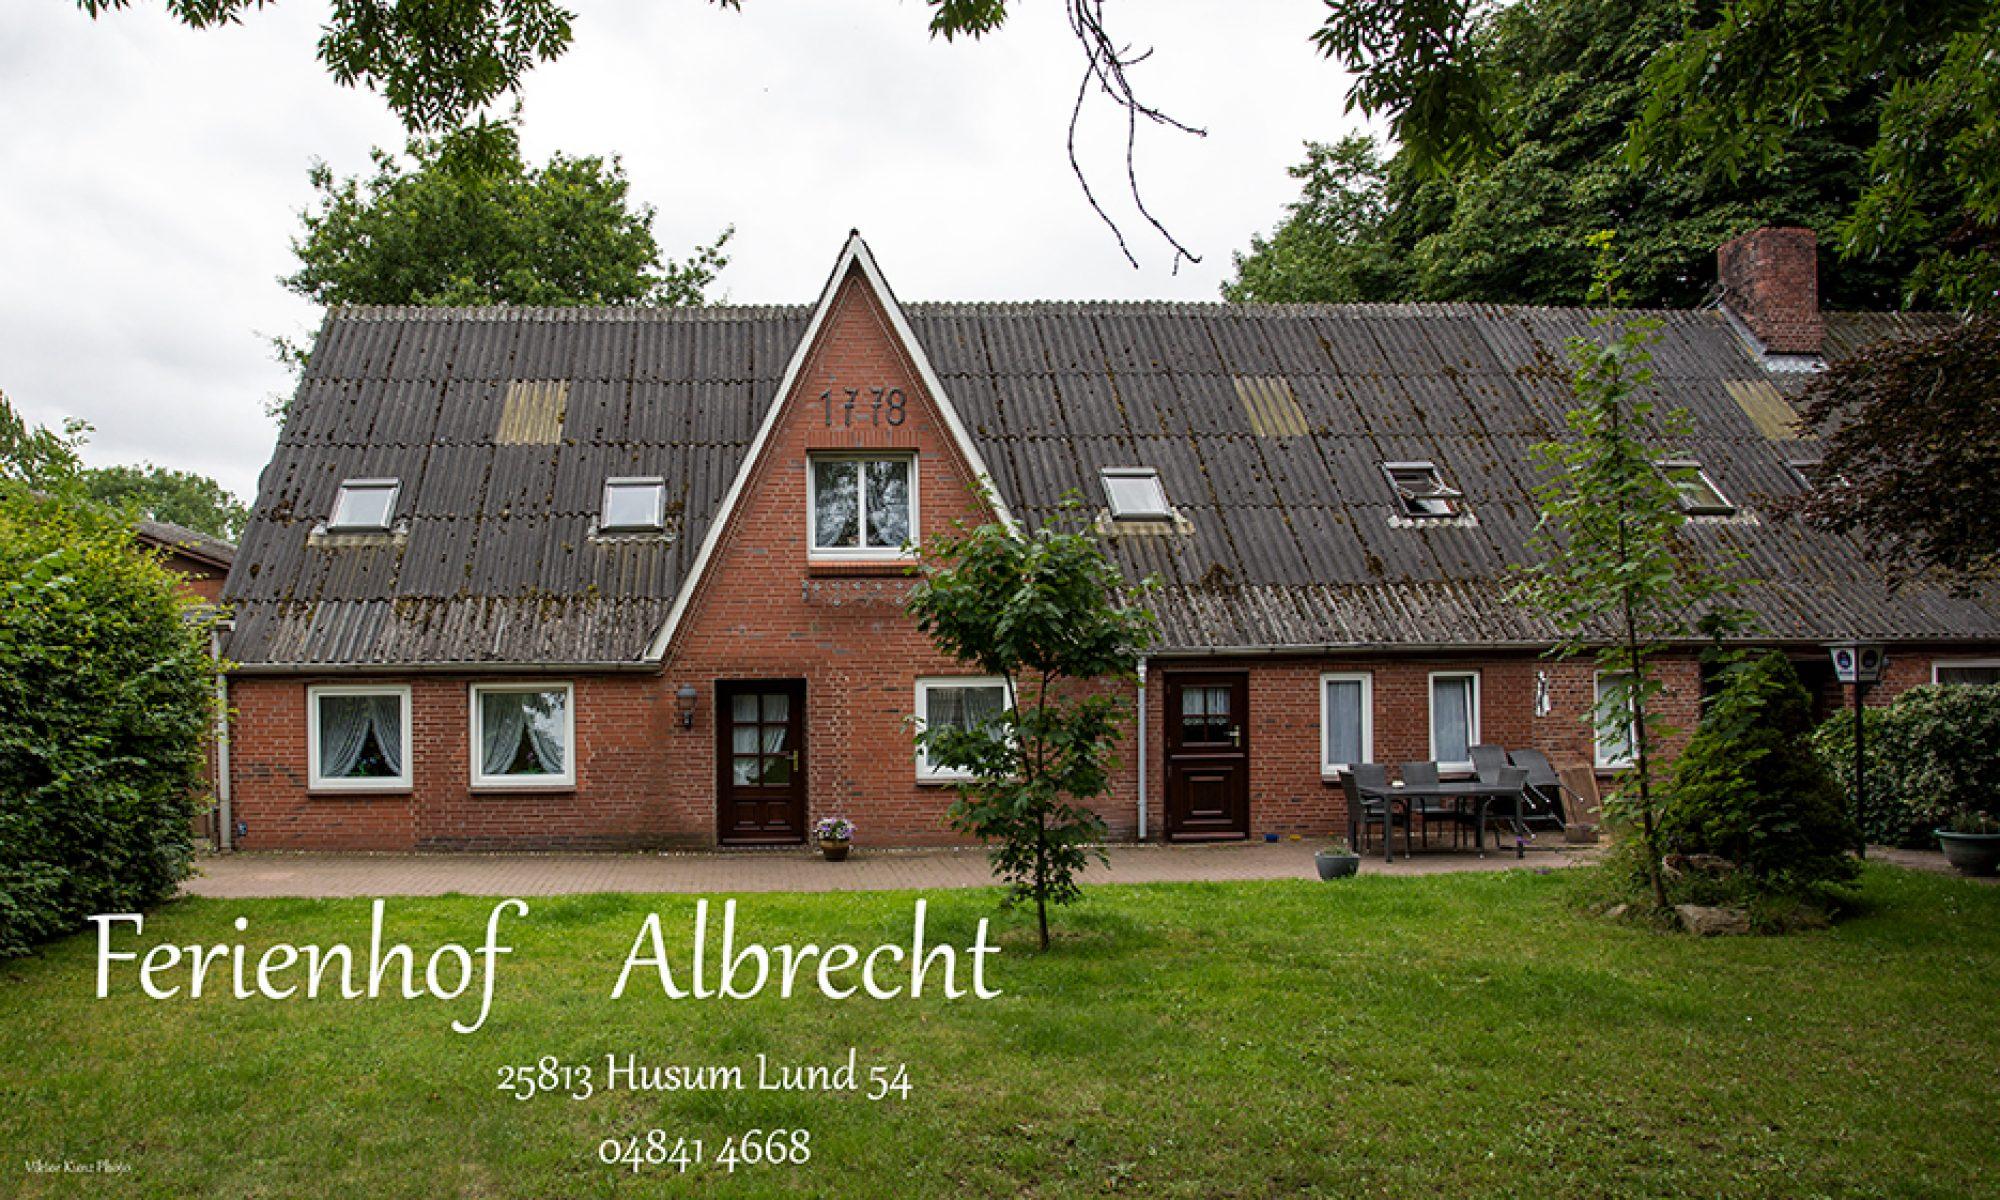 Ferienhof Albrecht